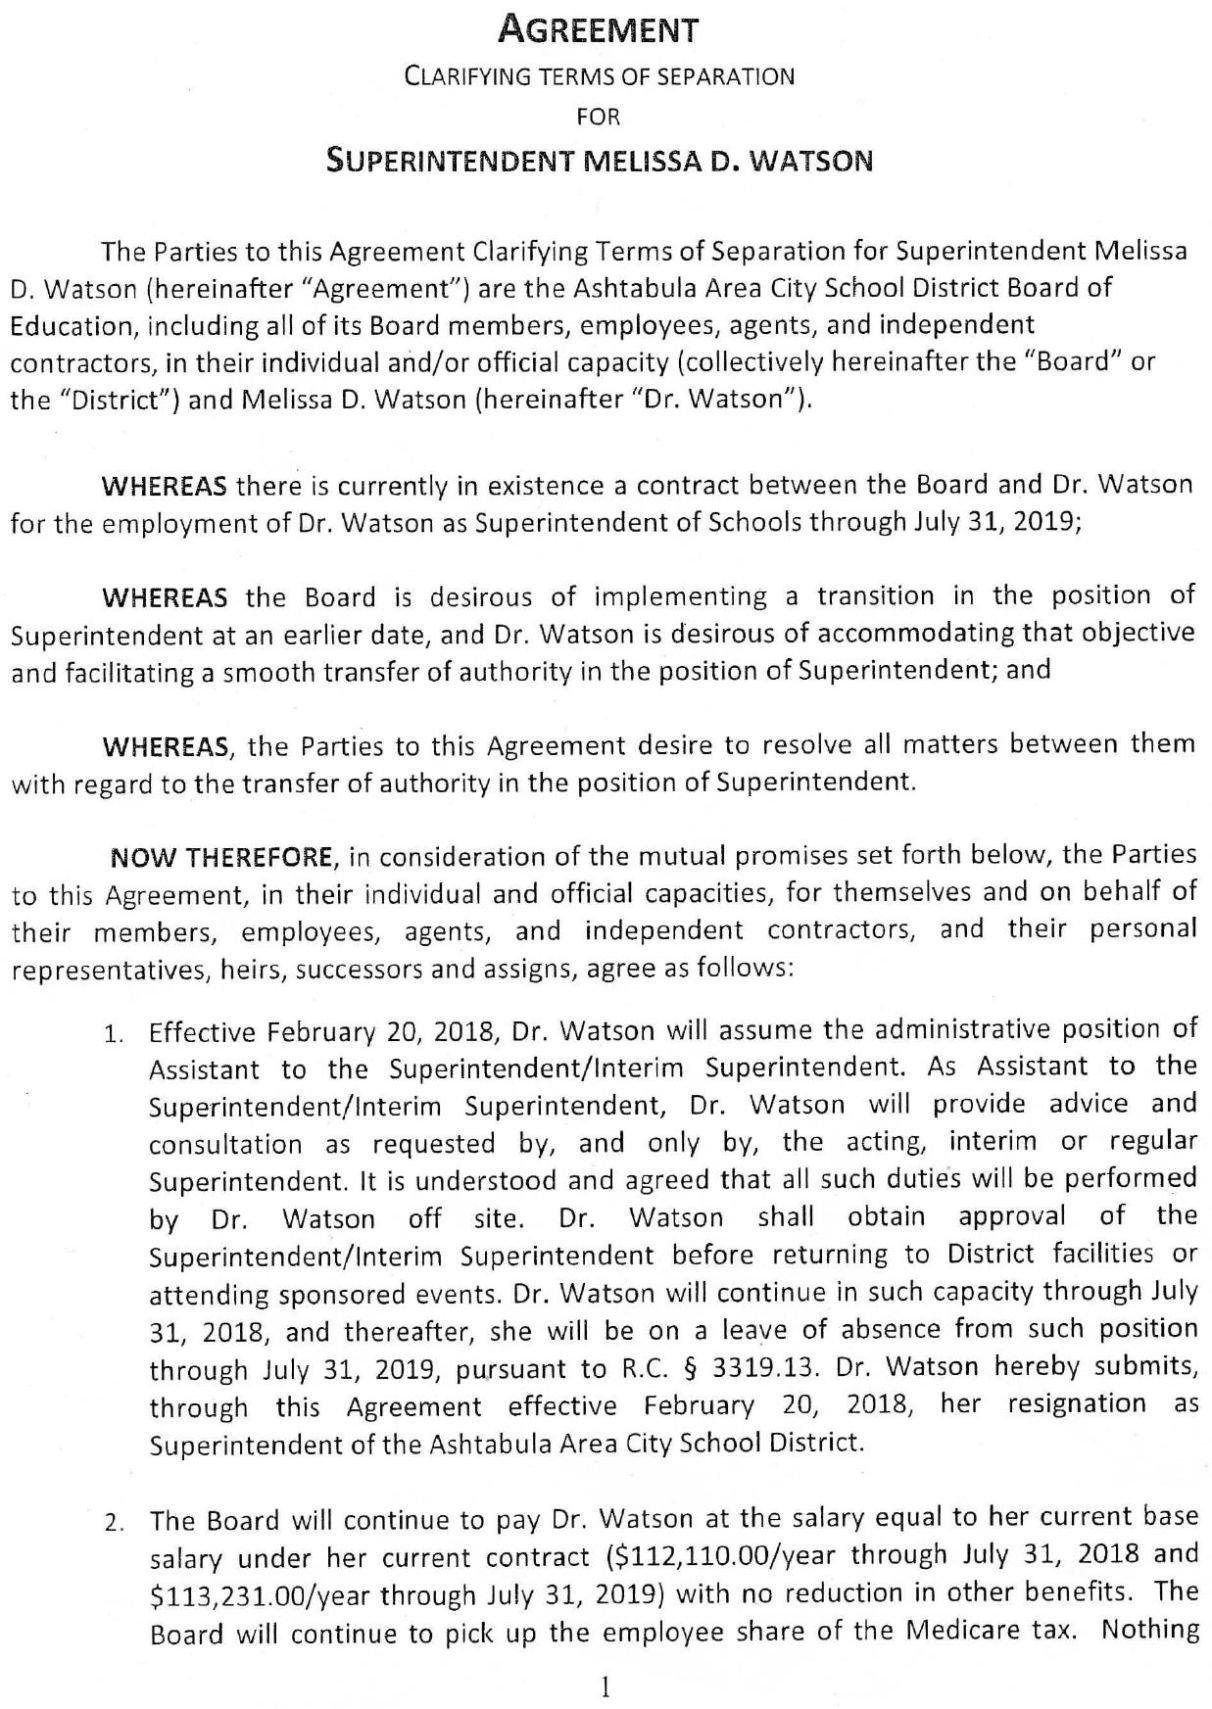 Download PDF AACS Watson Separation Agreement